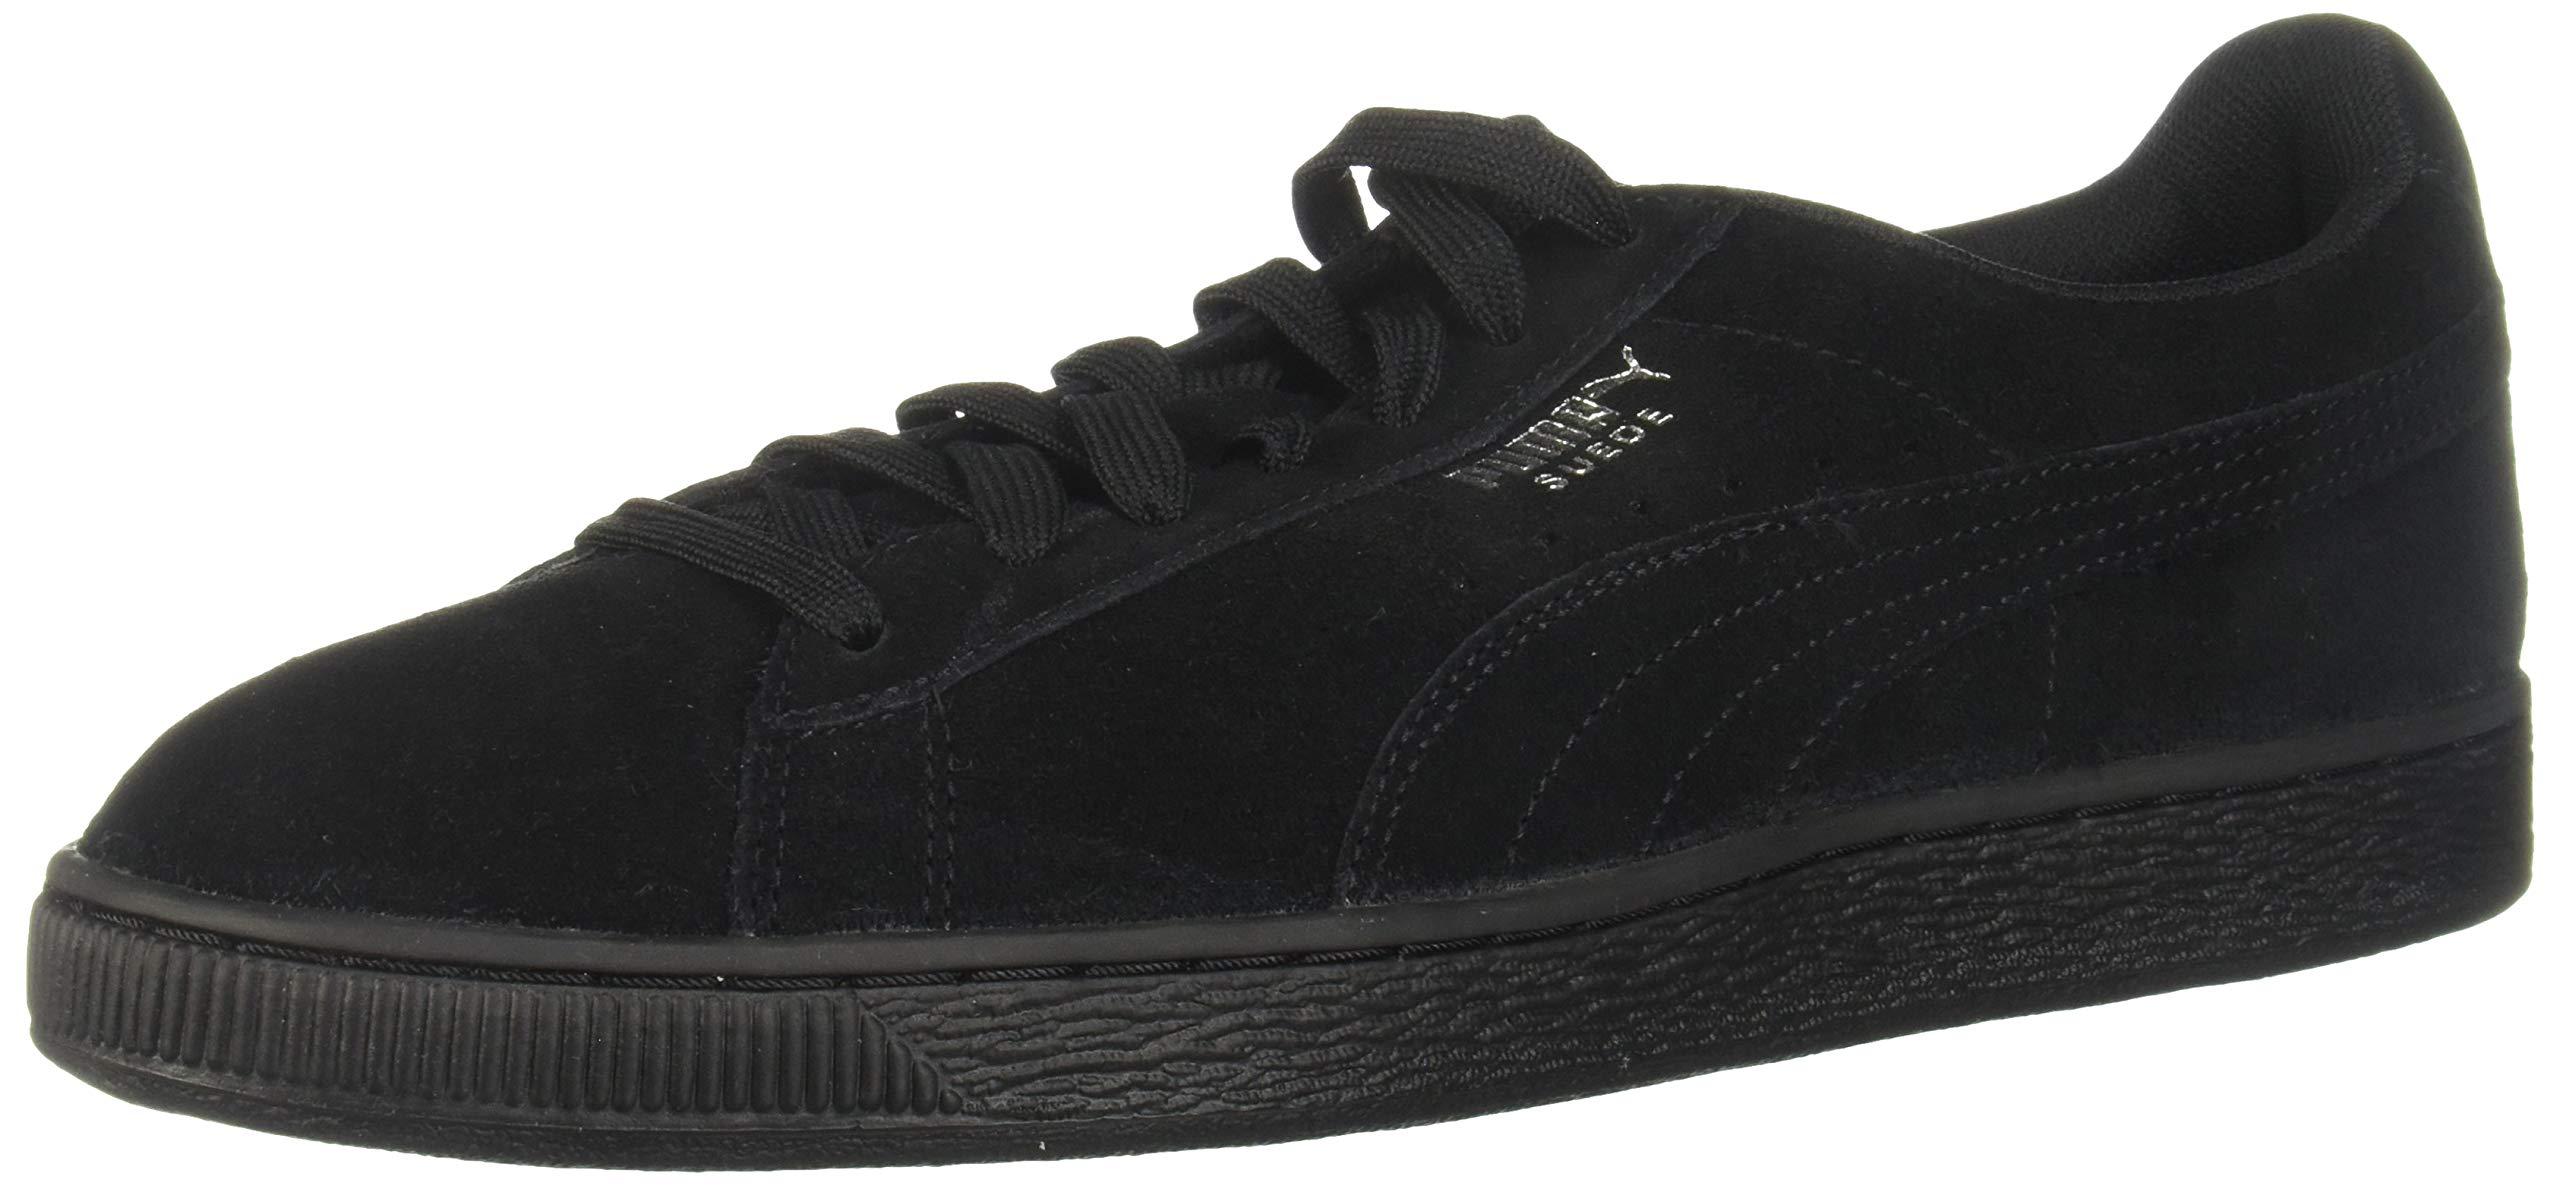 PUMA Suede Classic Sneaker,Black,7 M US Women's/5.5 M US Men's